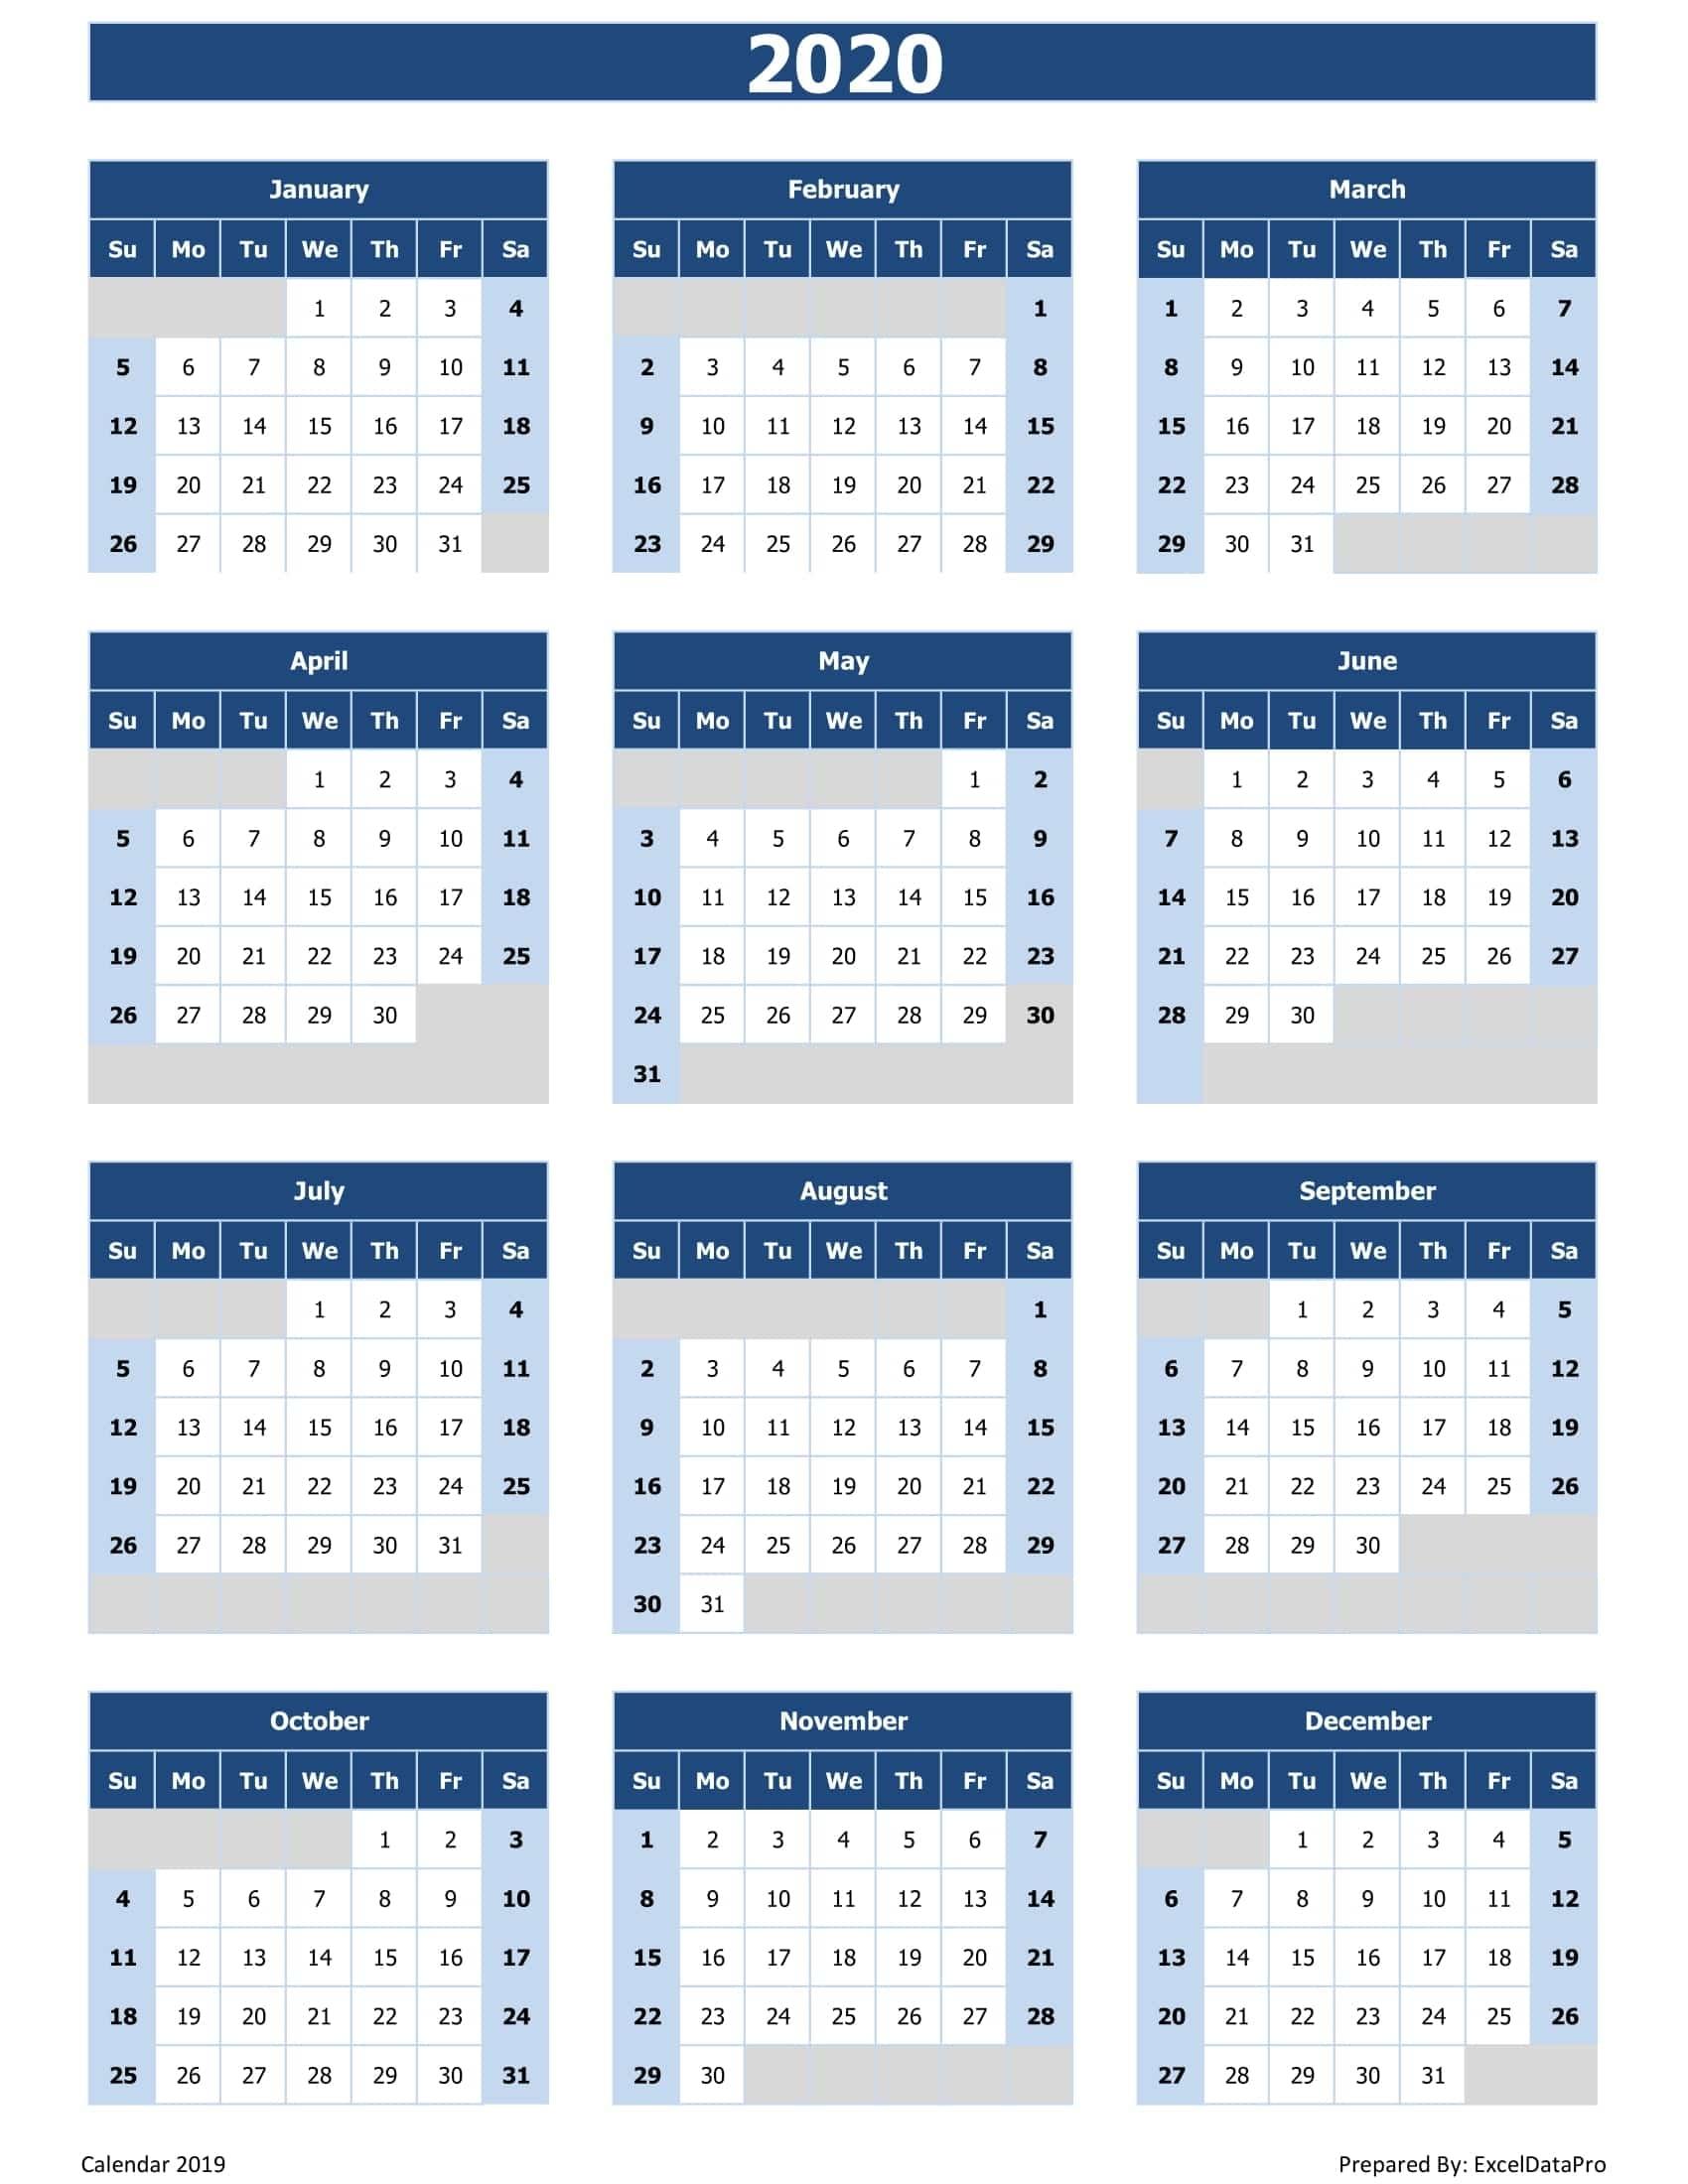 Excel Calendar Spreadsheet Formulas Xls March Drop Down